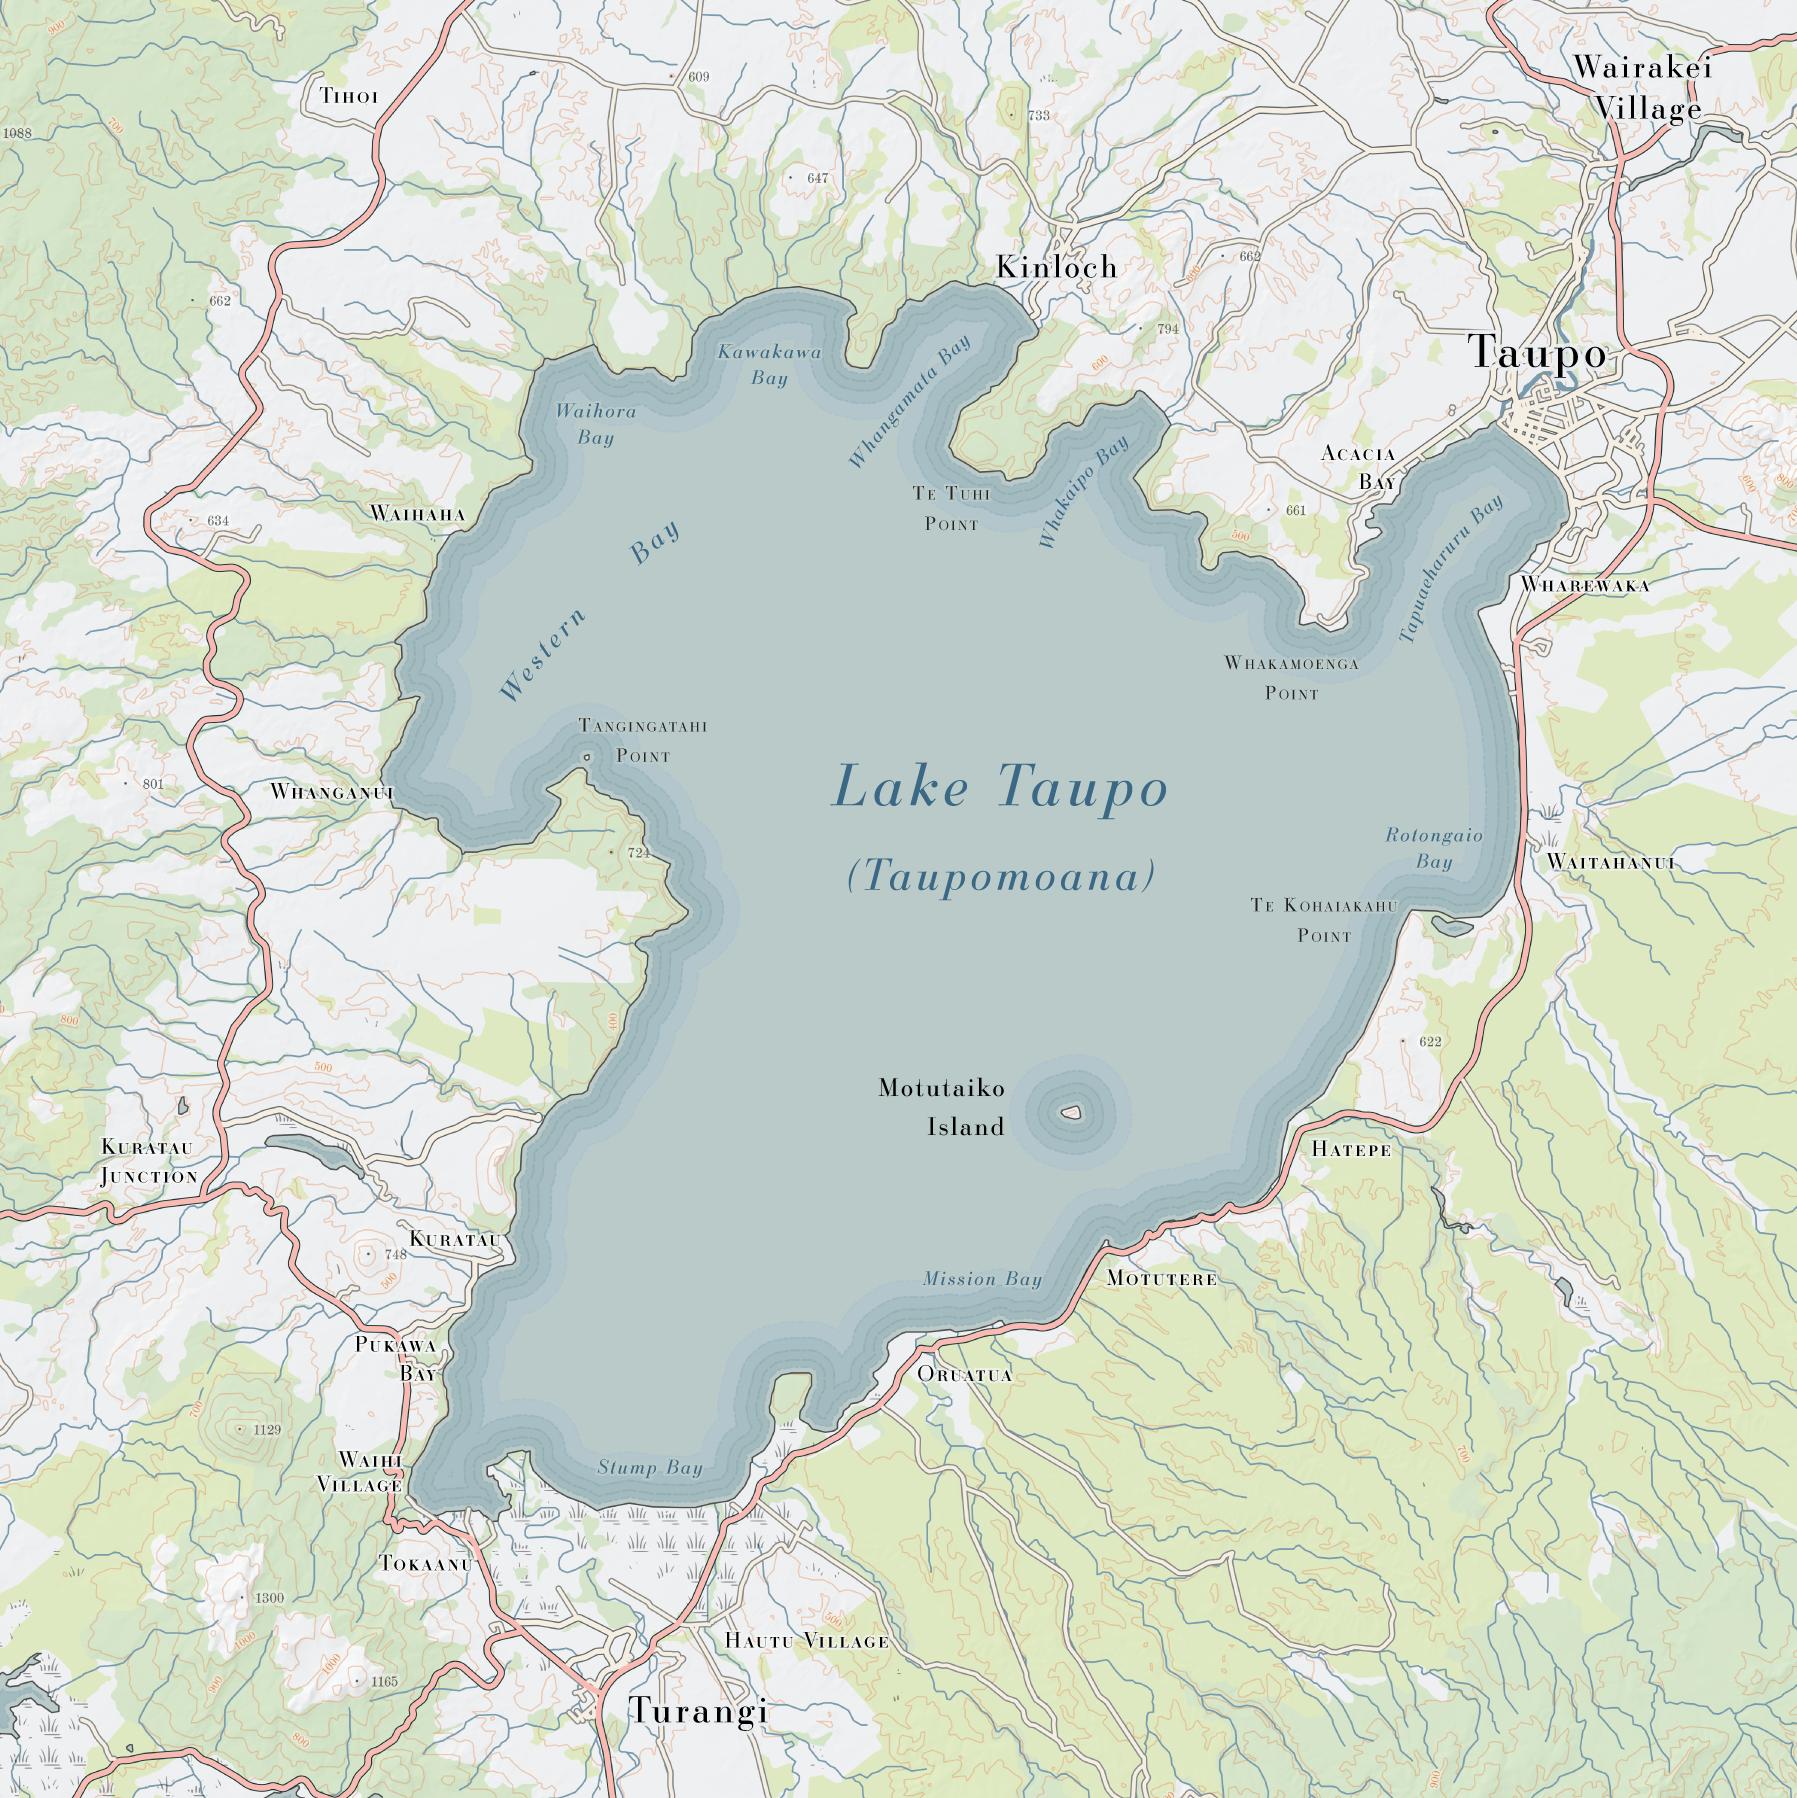 Map Of Taupo New Zealand.Lake Taupo Print The Map Kiwi